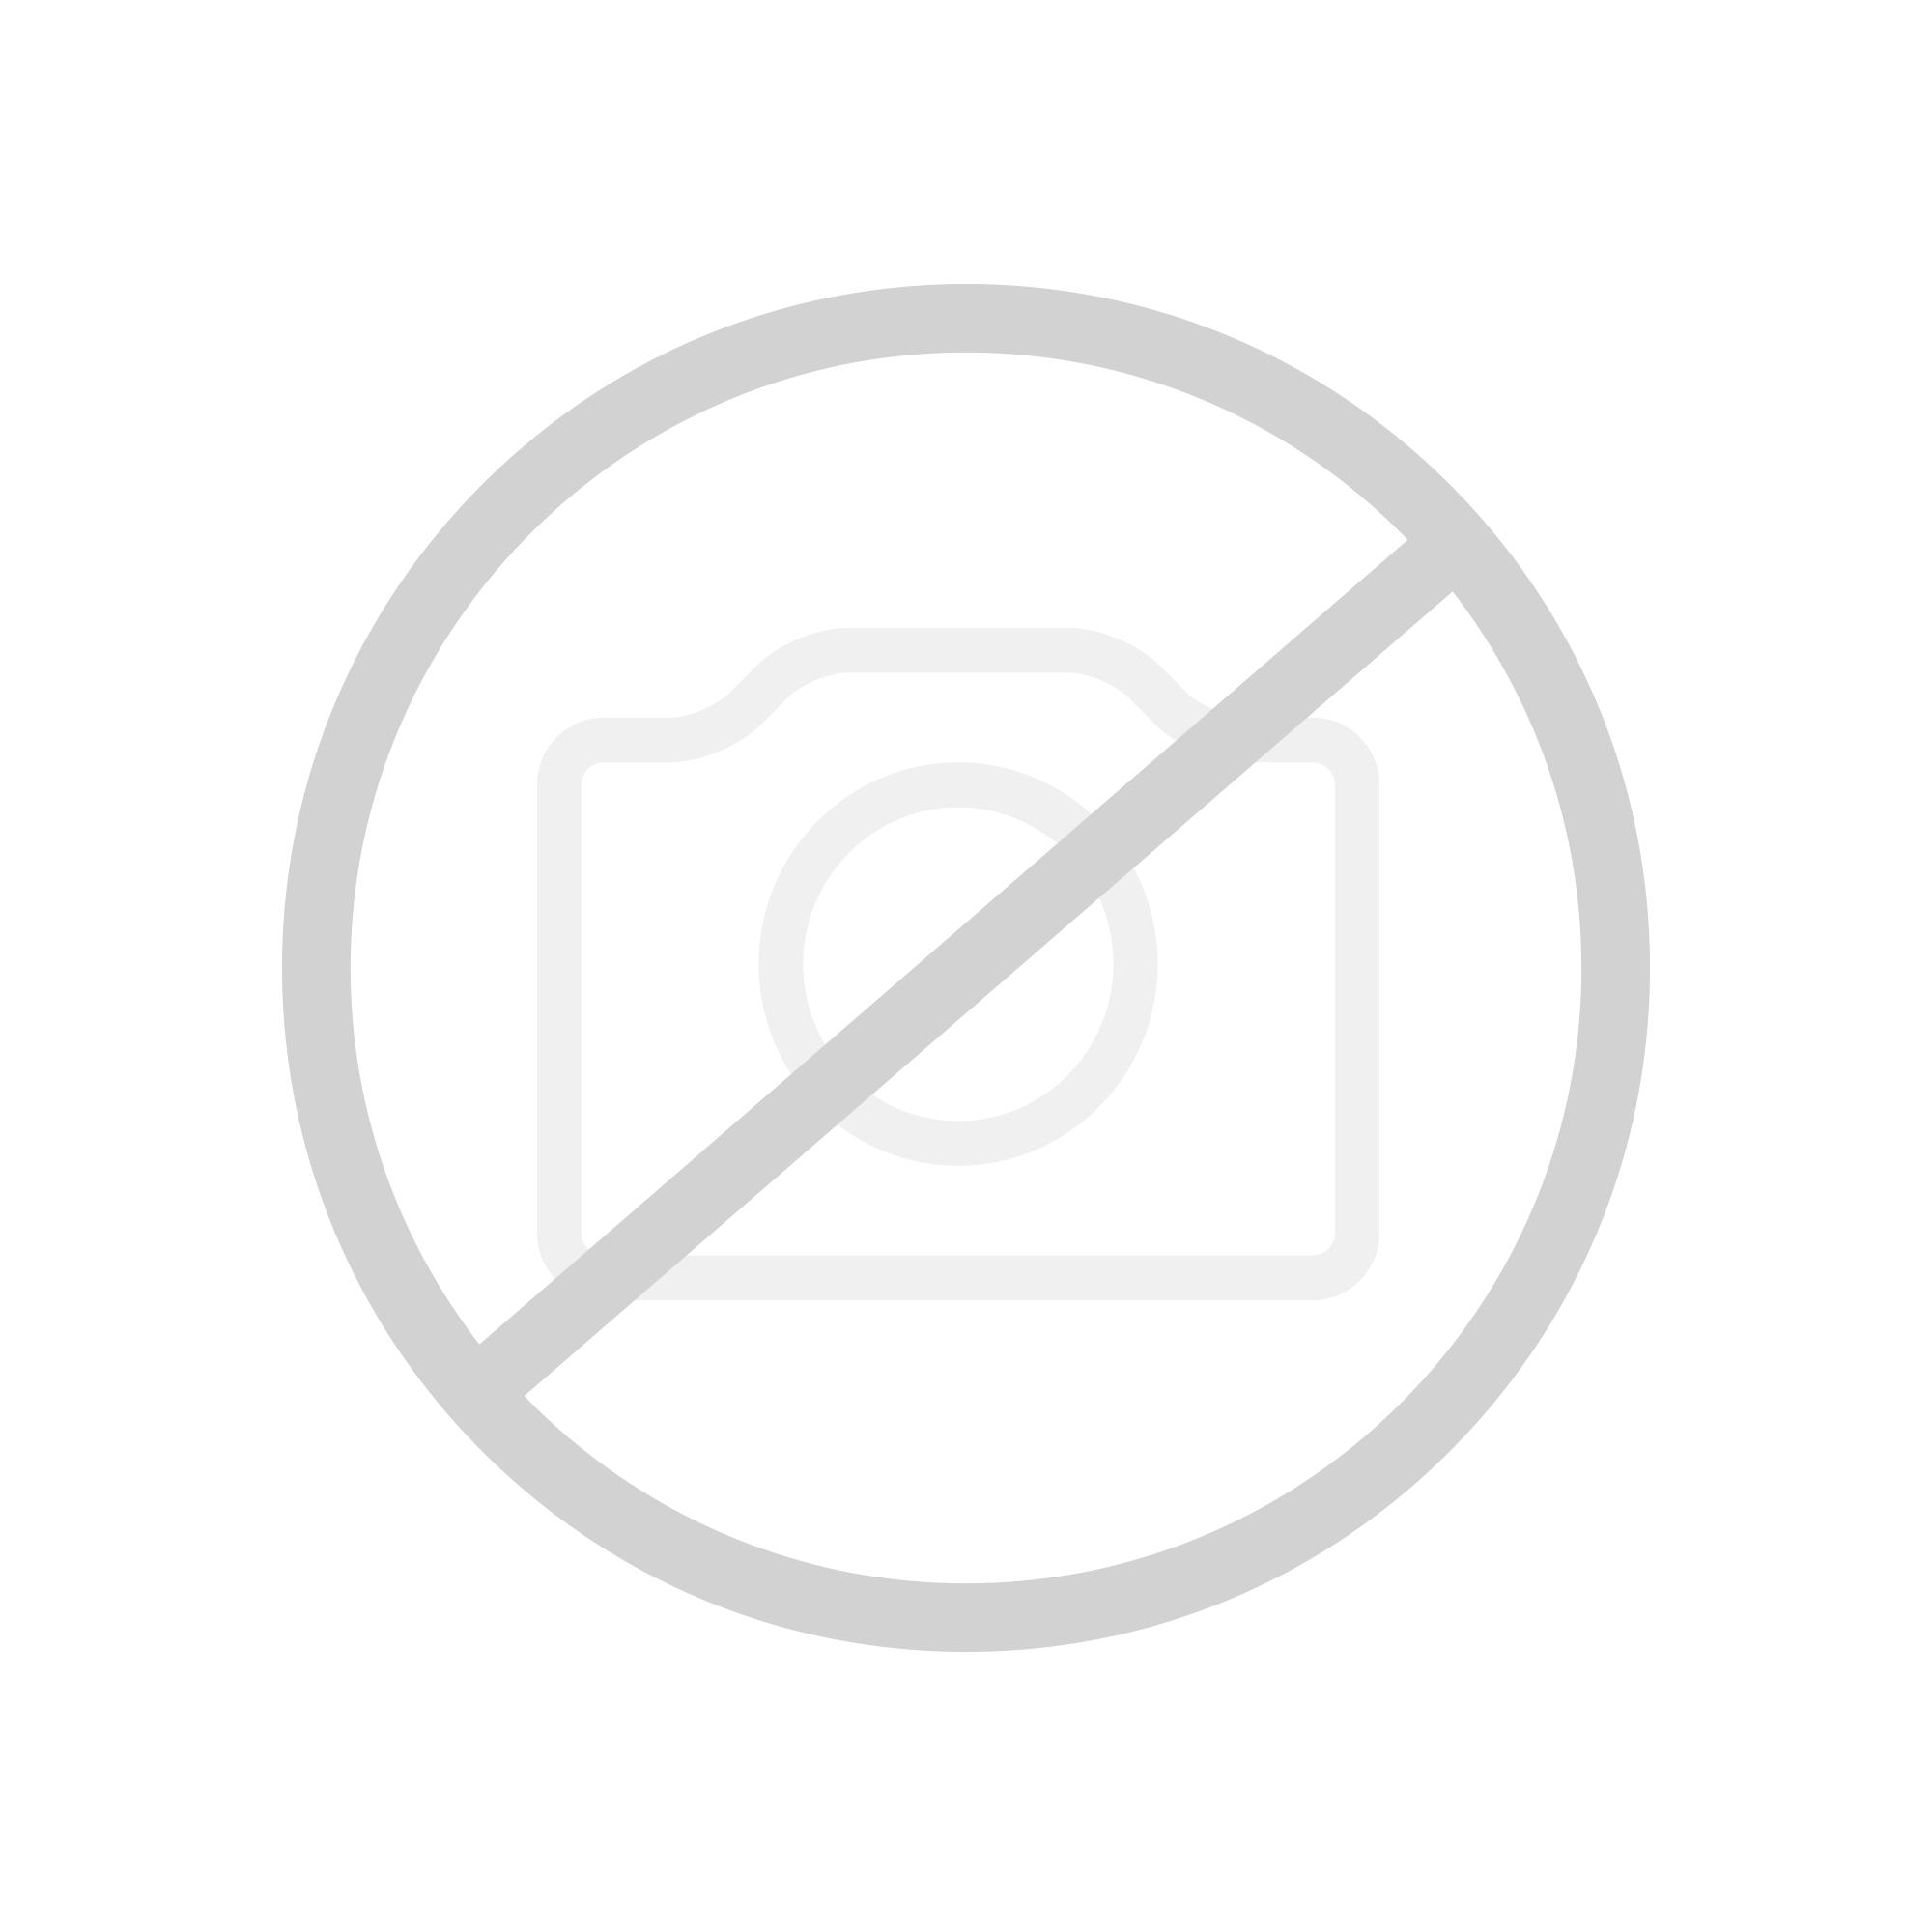 mepa sanit rtechnik online bestellen im reuter shop. Black Bedroom Furniture Sets. Home Design Ideas